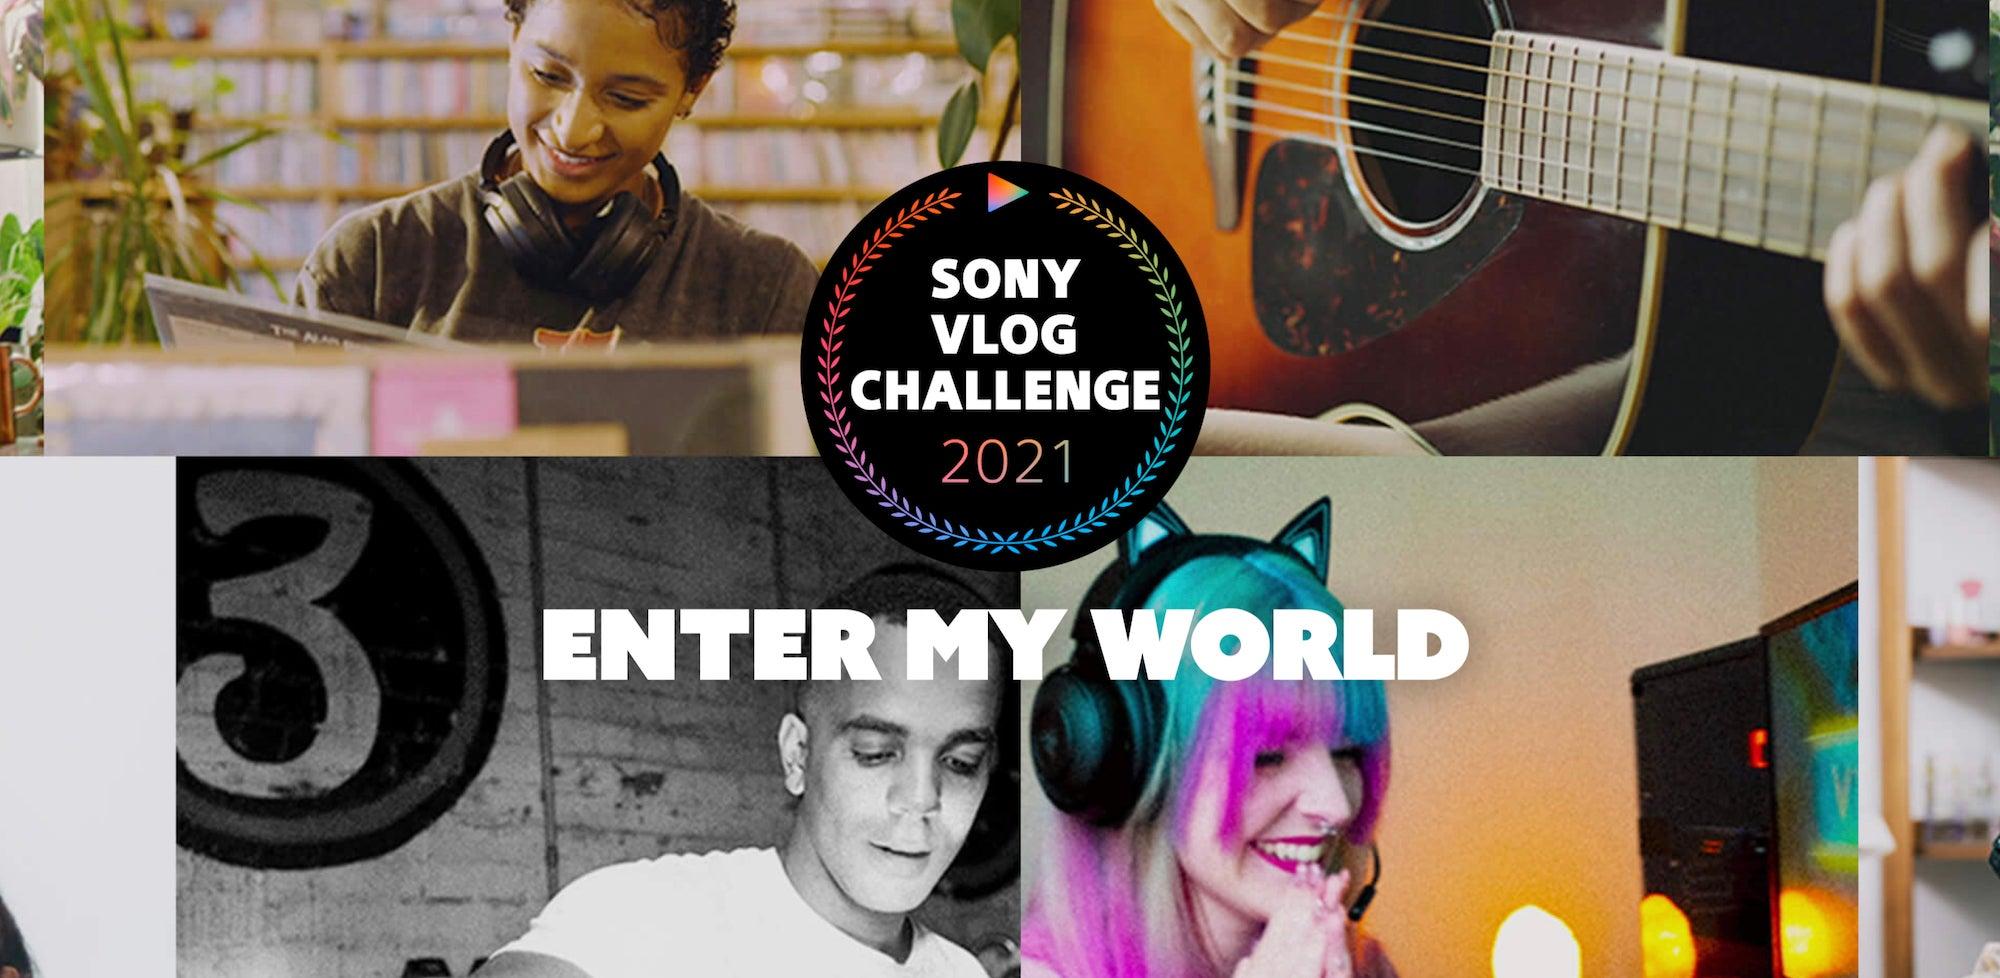 Alpha-Universe-Sony-Vlog-Contest-2021-hero.jpg